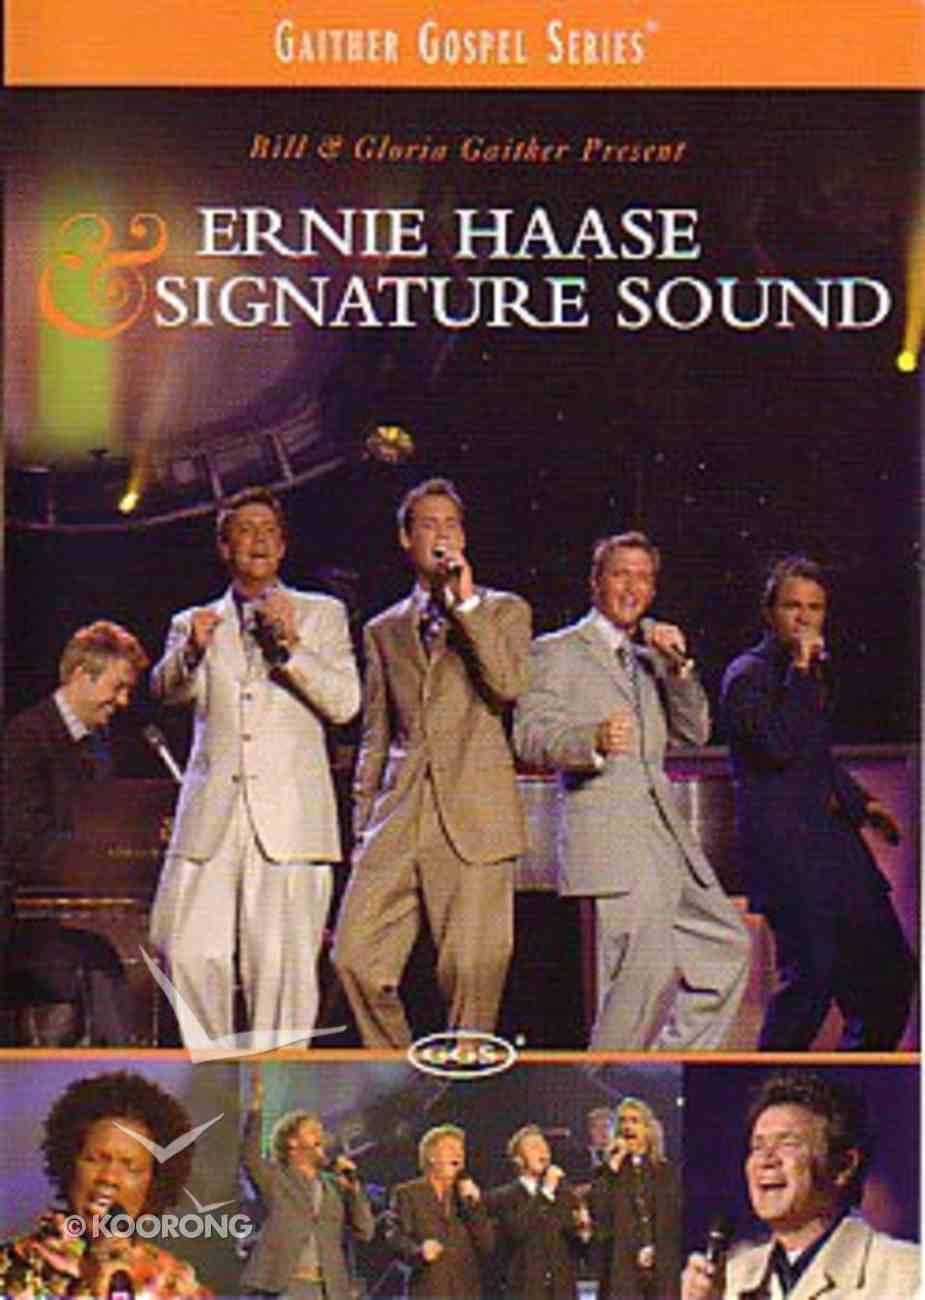 Ernie Haase & Signature Sound Quartet (Gaither Gospel Series) DVD